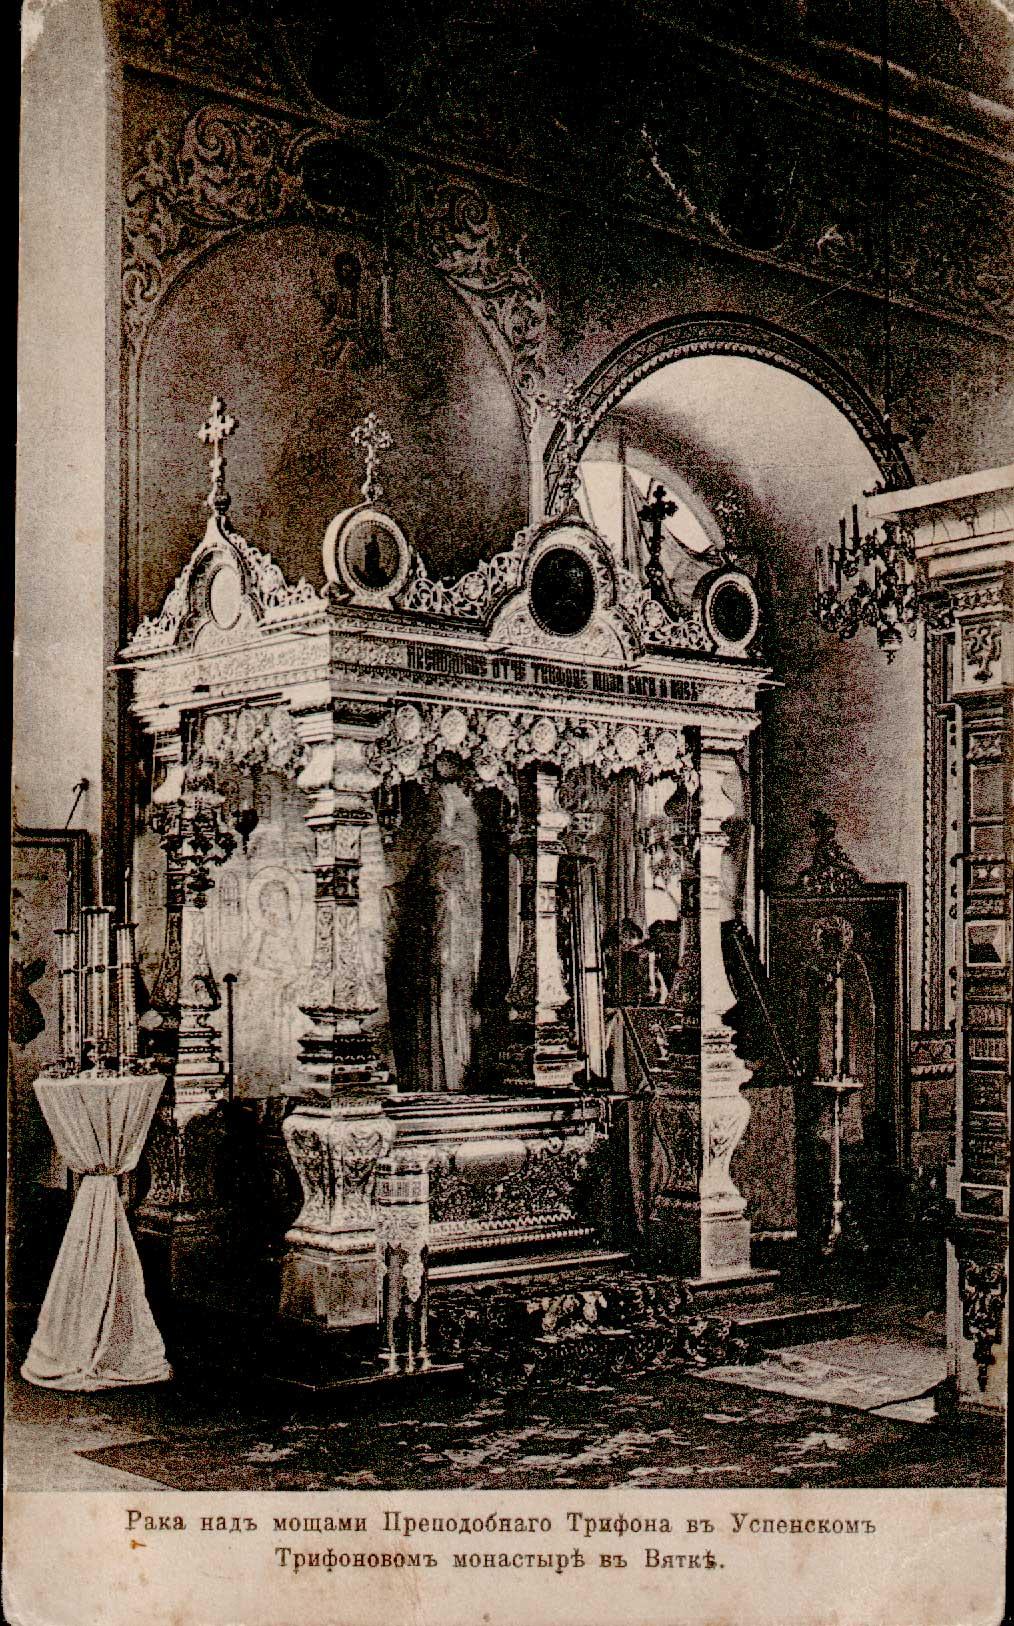 Успенский Трифоновский собор. Рака над мощами преподобного Трифона